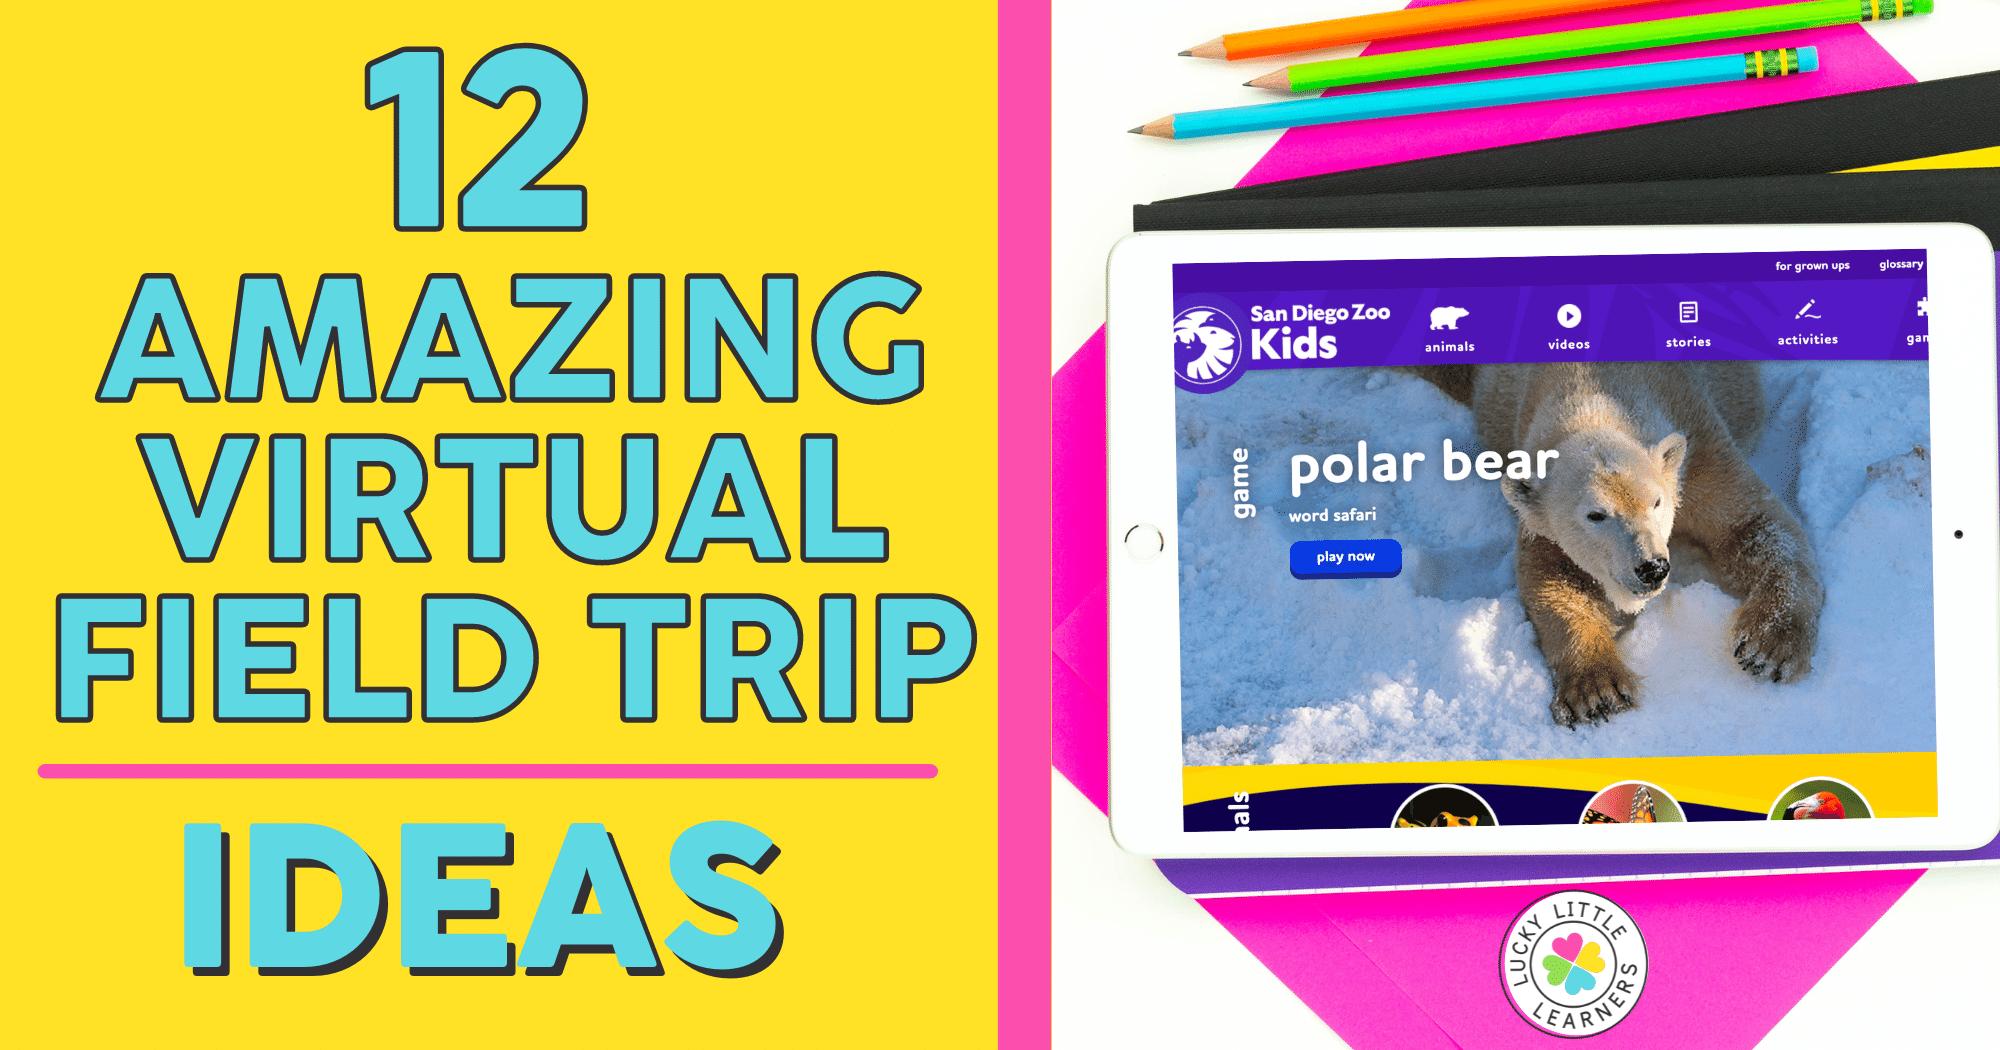 12 Amazing Virtual Field Trip Ideas